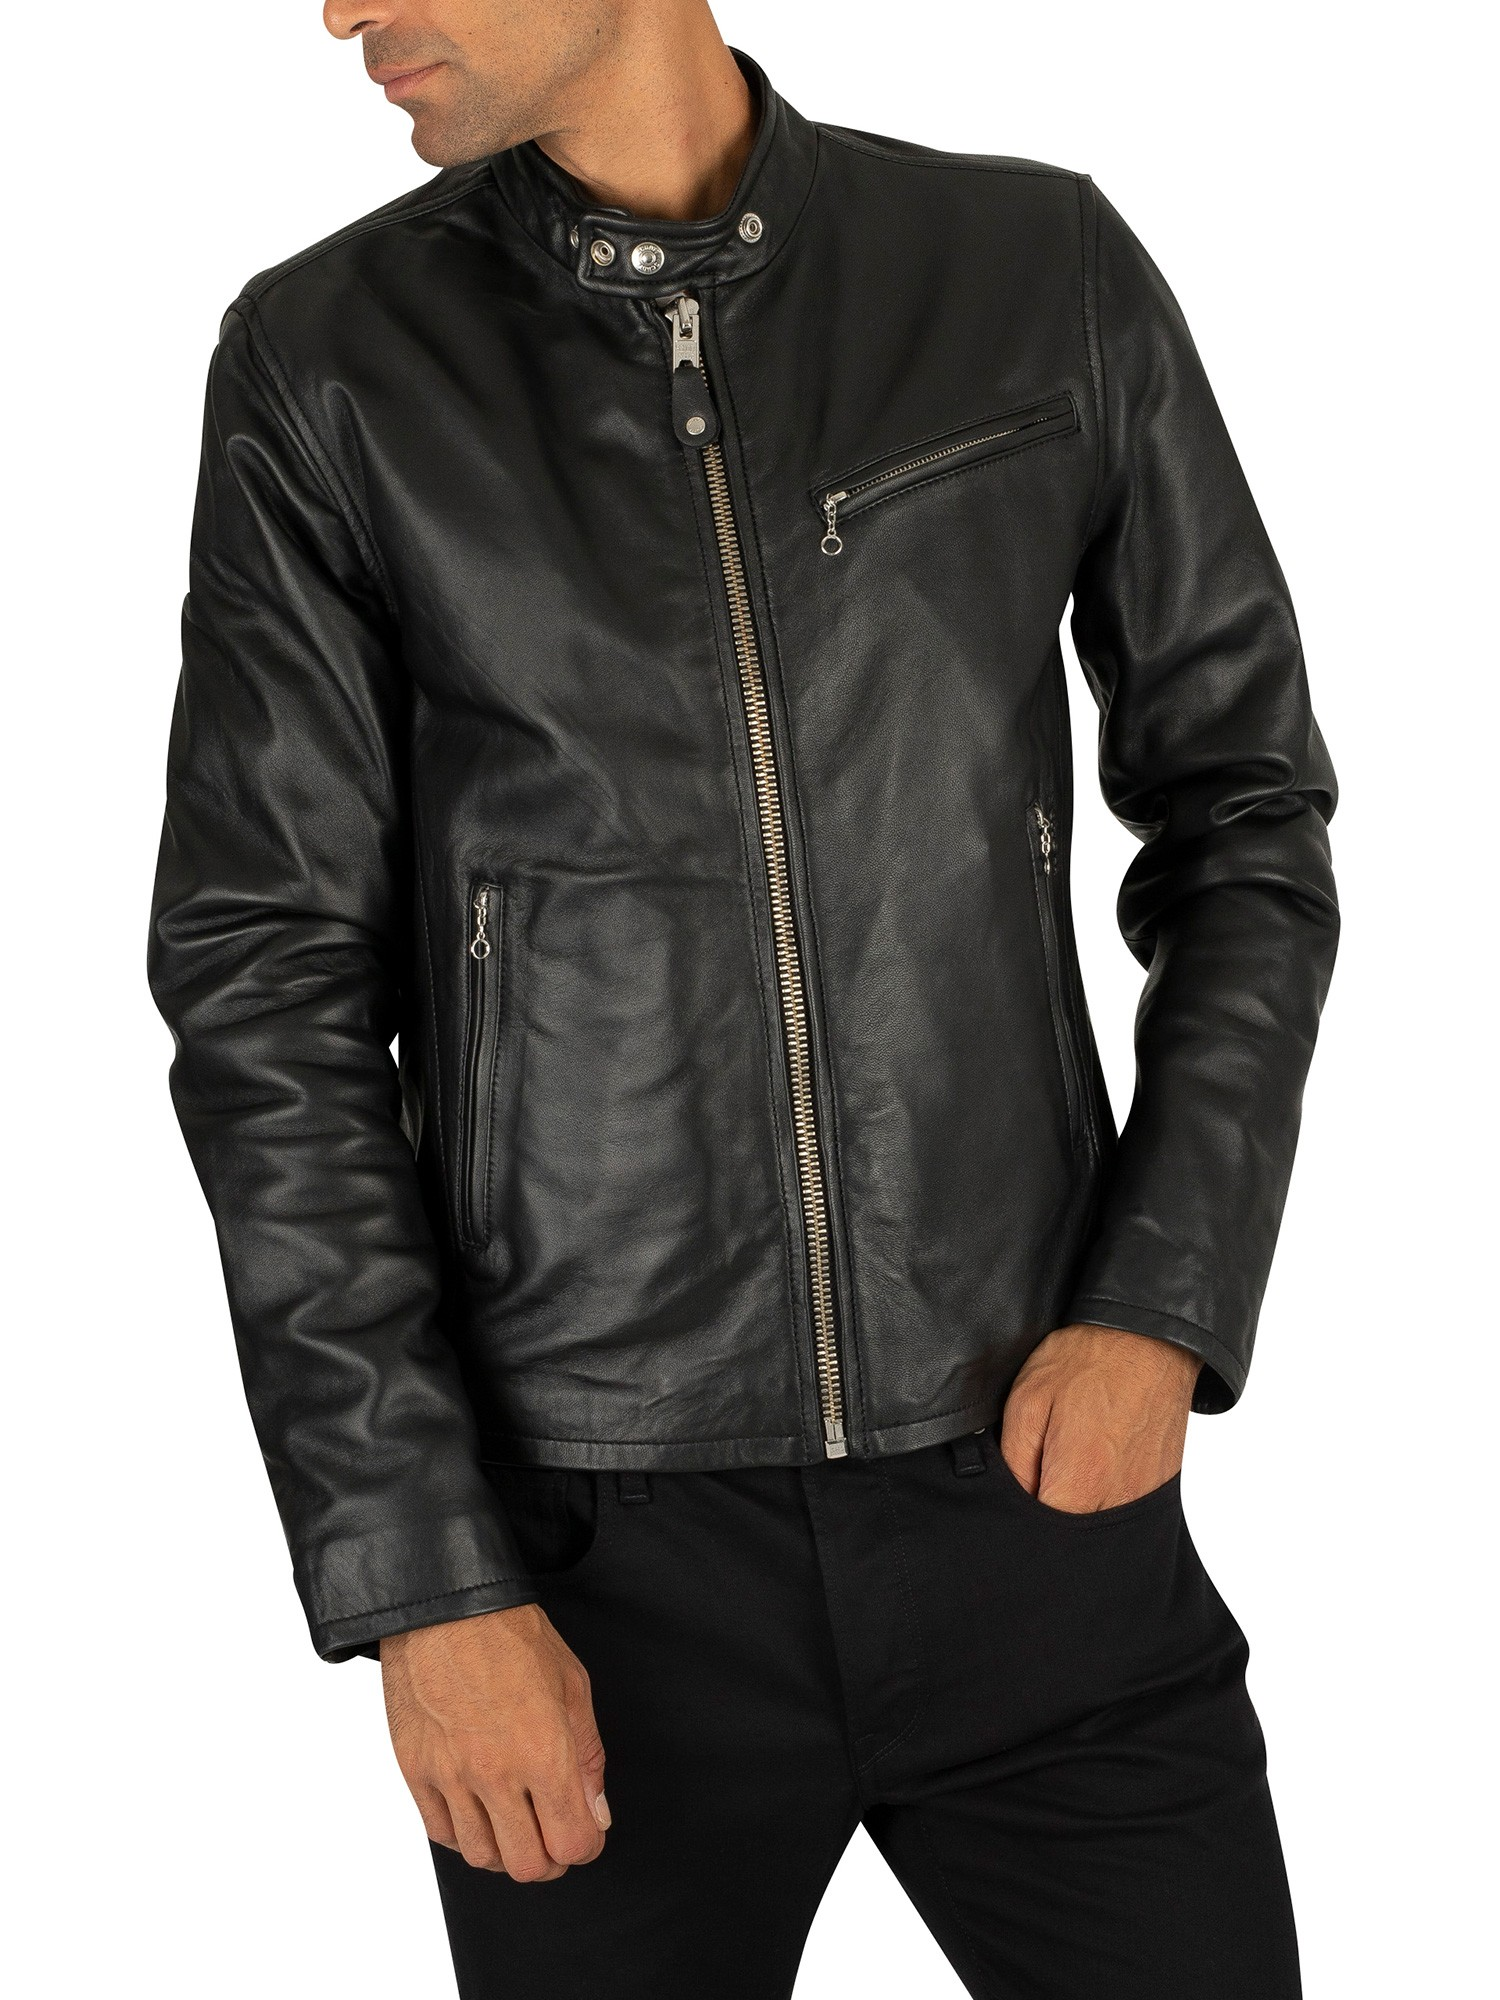 Schott Leather Jacket Black Standout